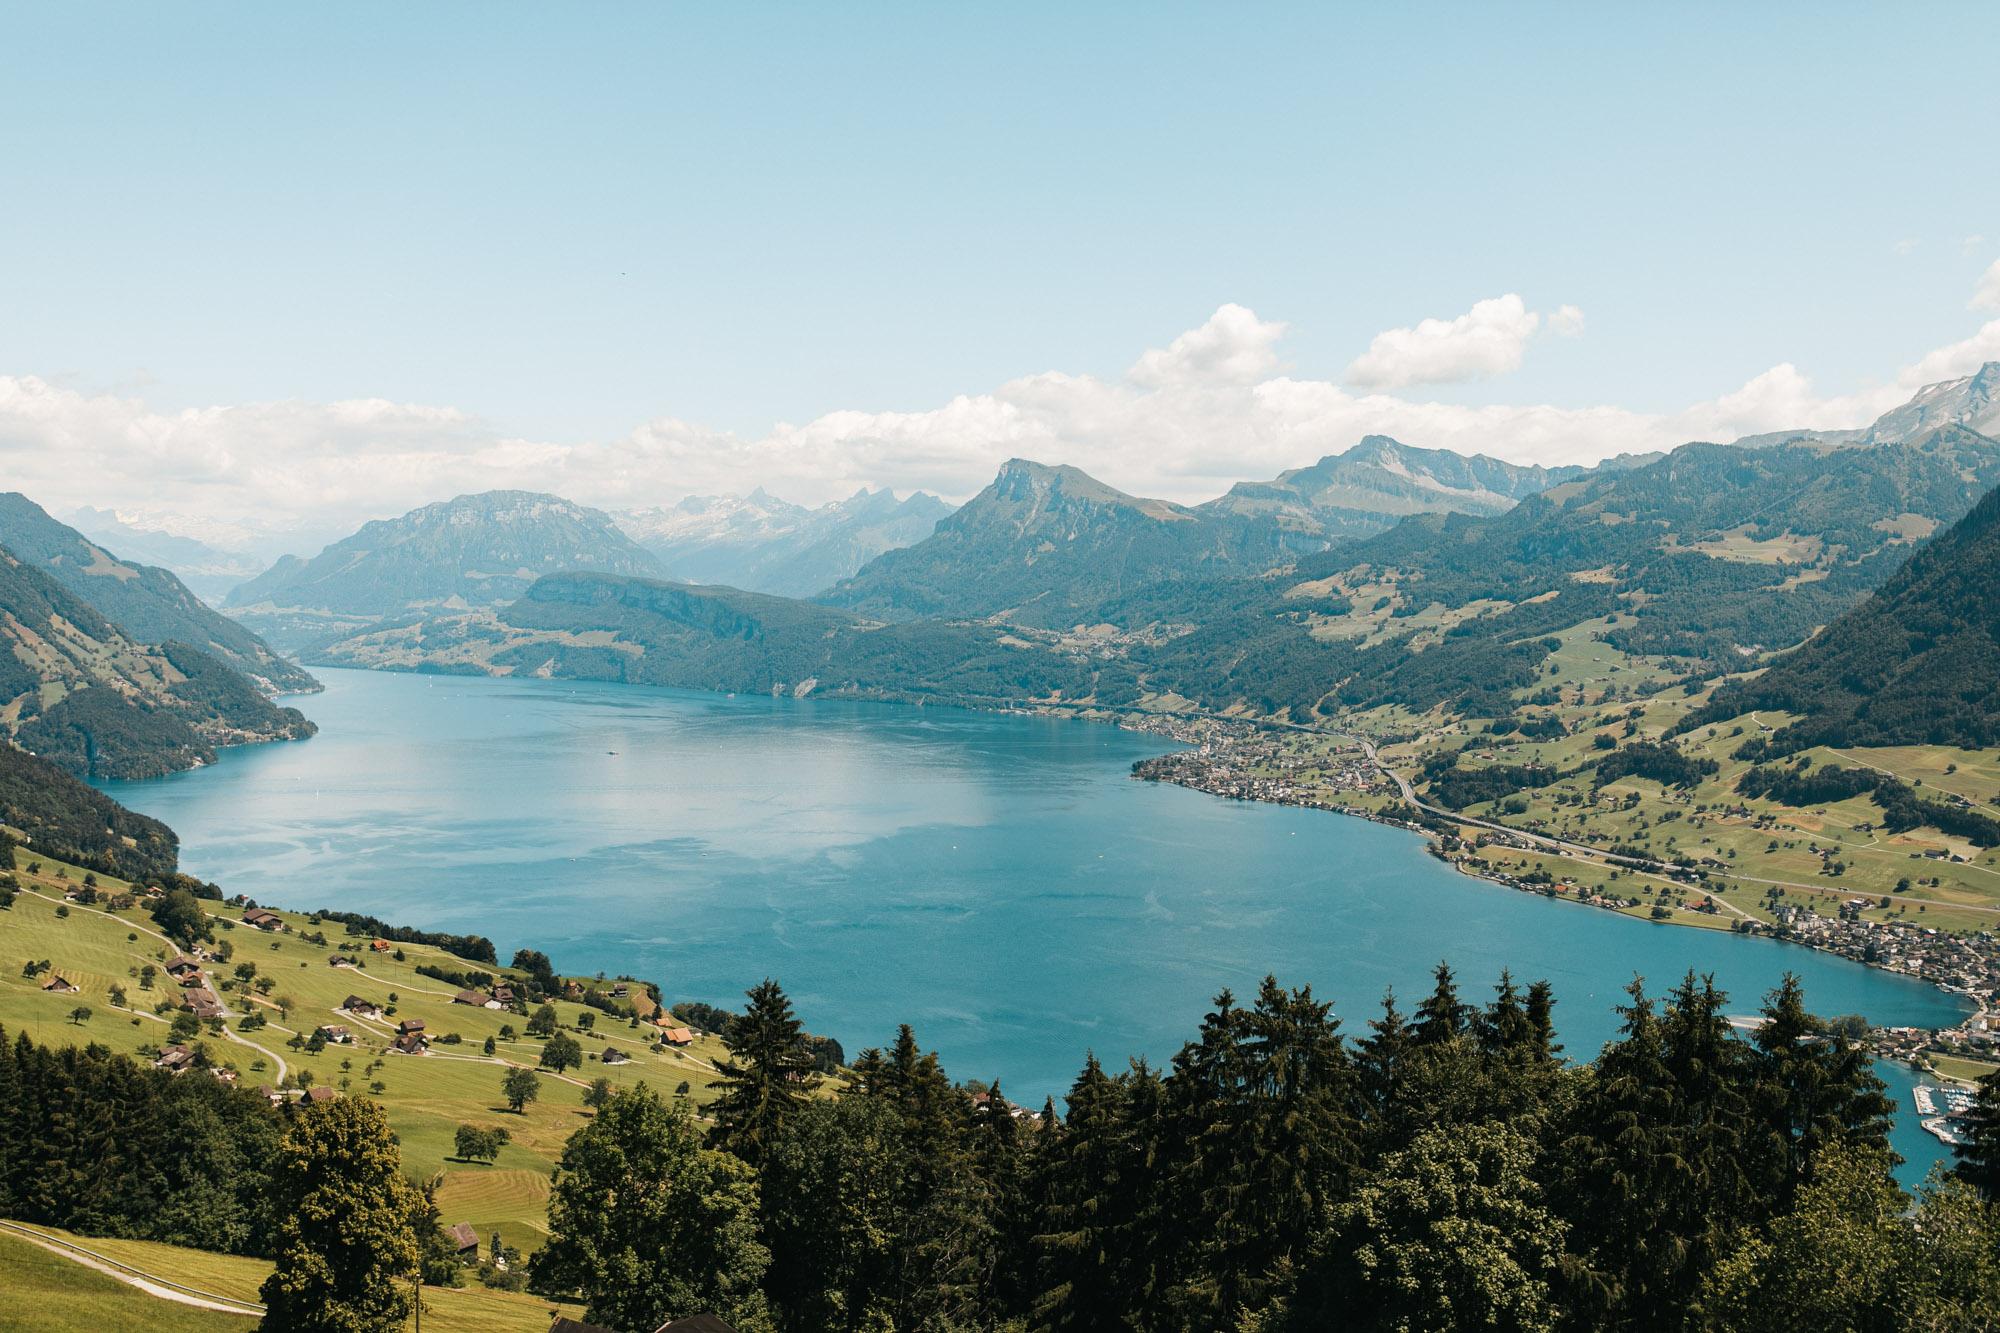 SwitzerlandBlog_HBGOODIE2018 (42 of 58).jpg